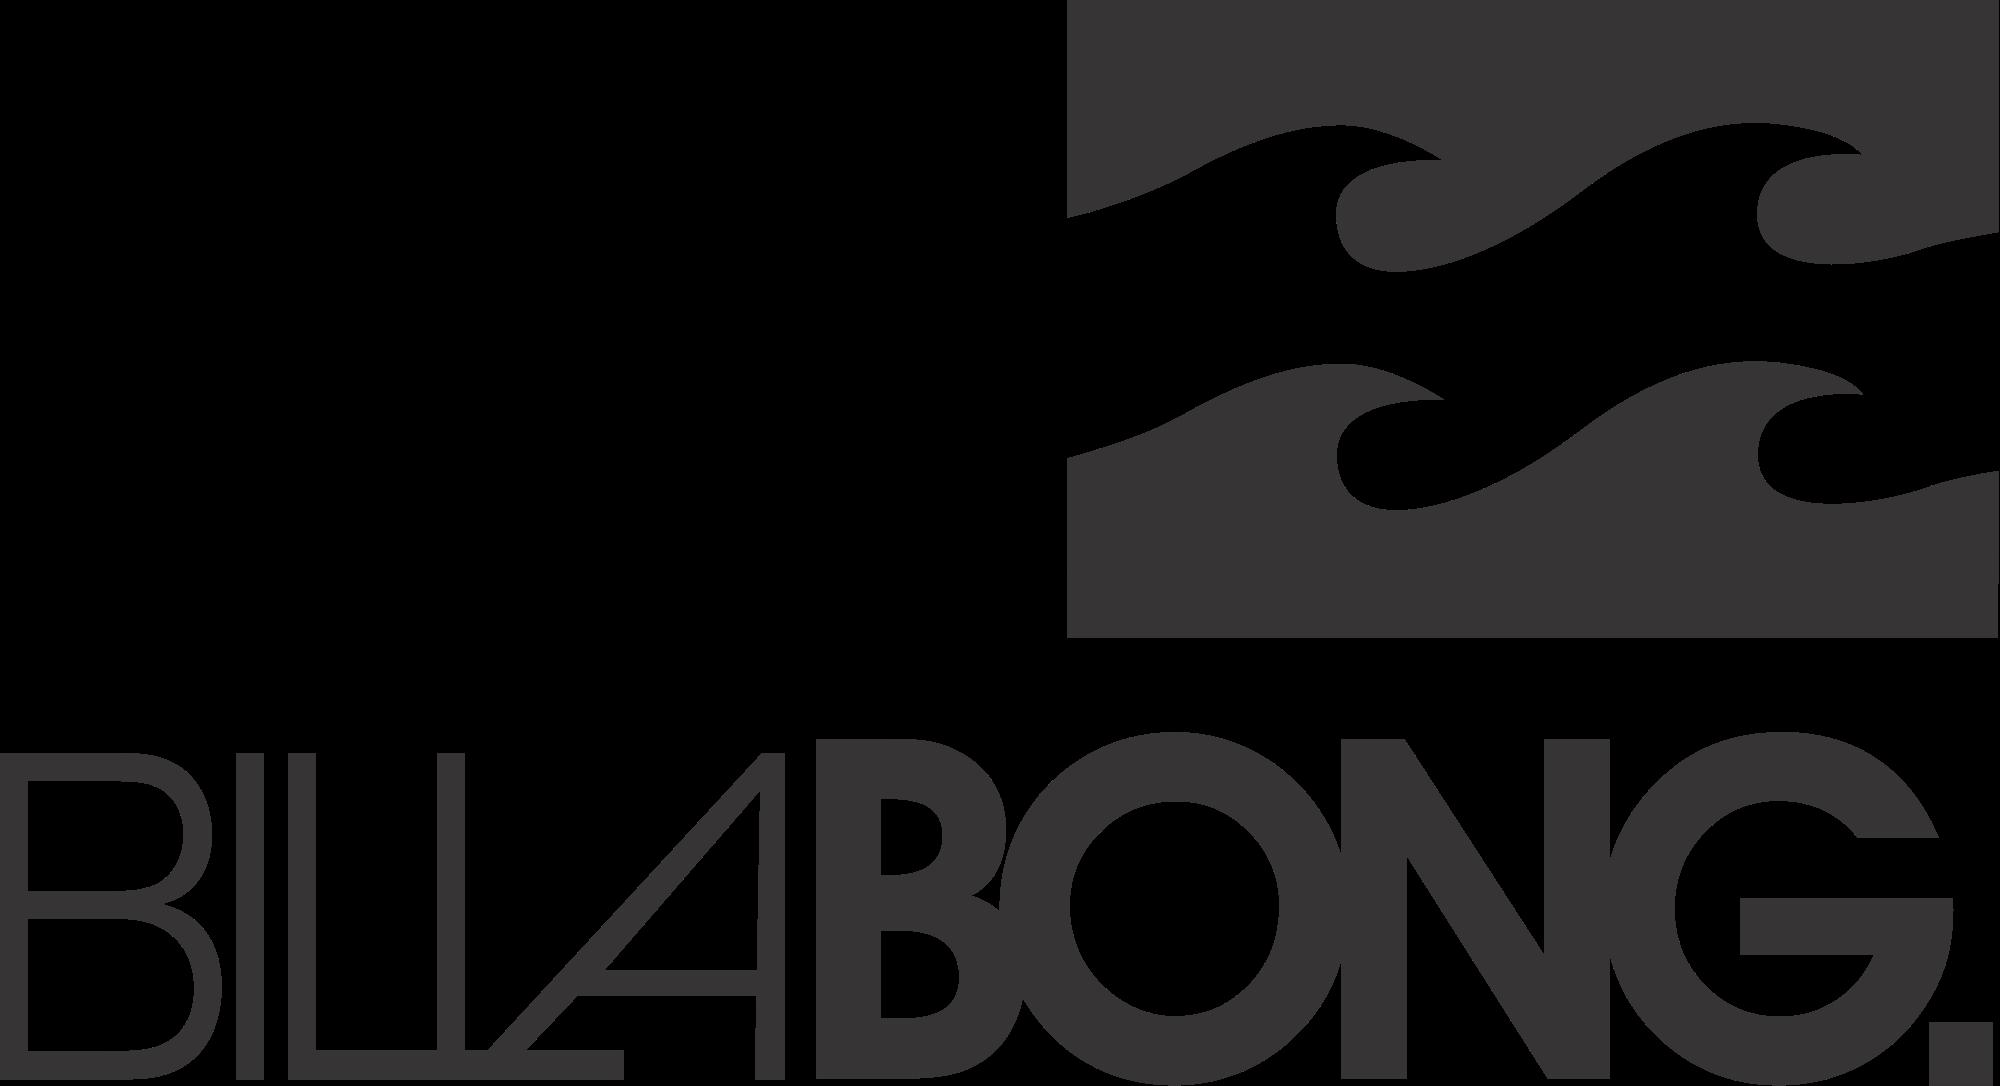 Billabong PNG